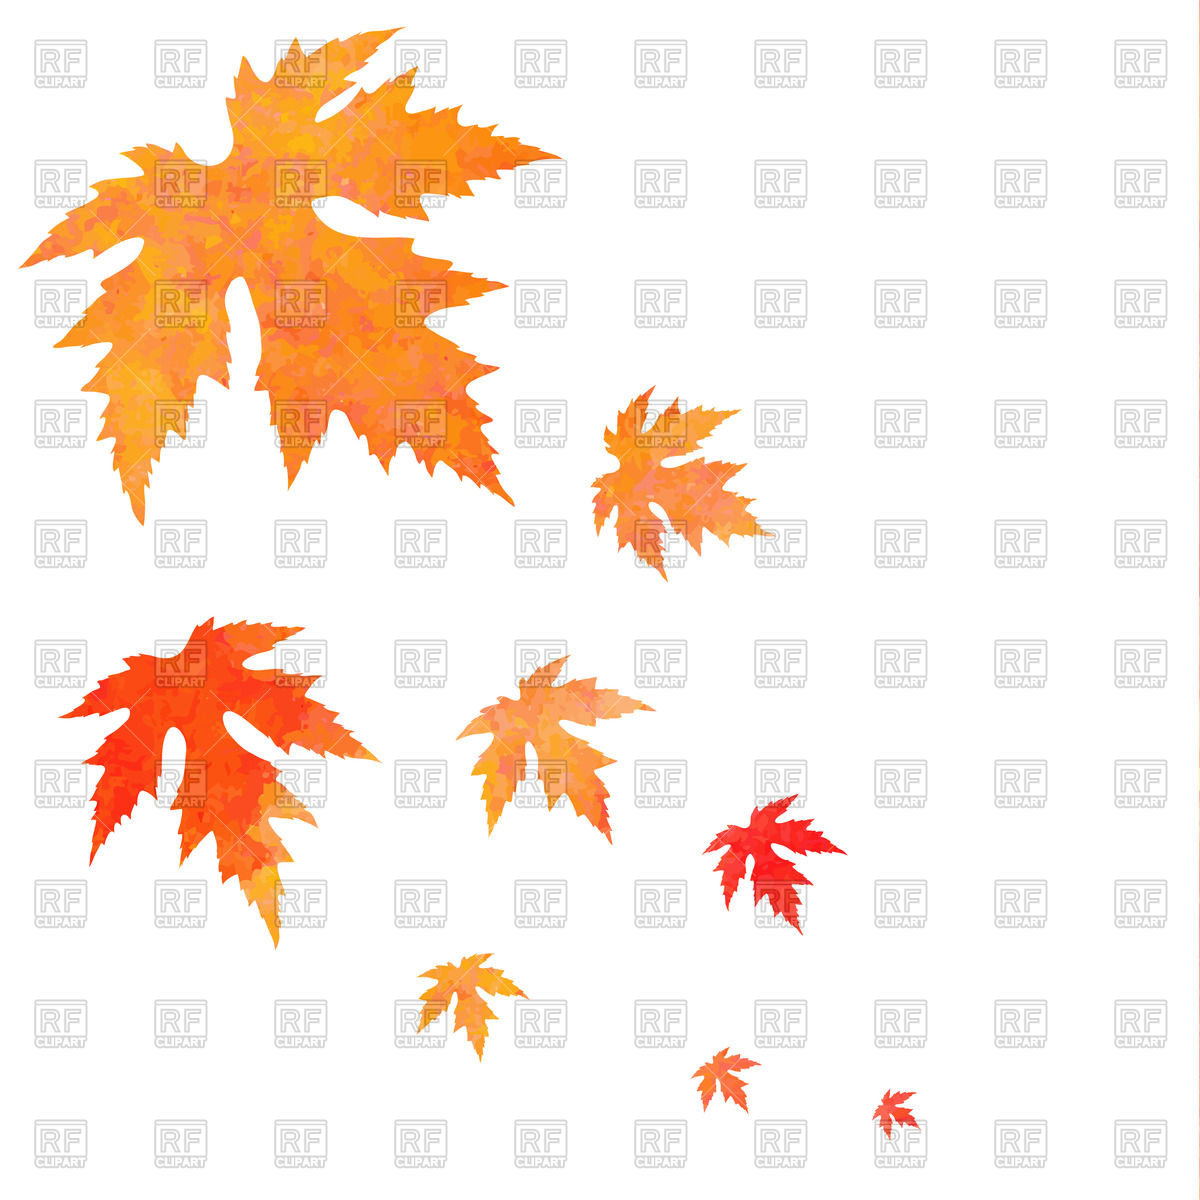 1200x1200 Watercolor Painted Orange Falling Maple Leaves Vector Image